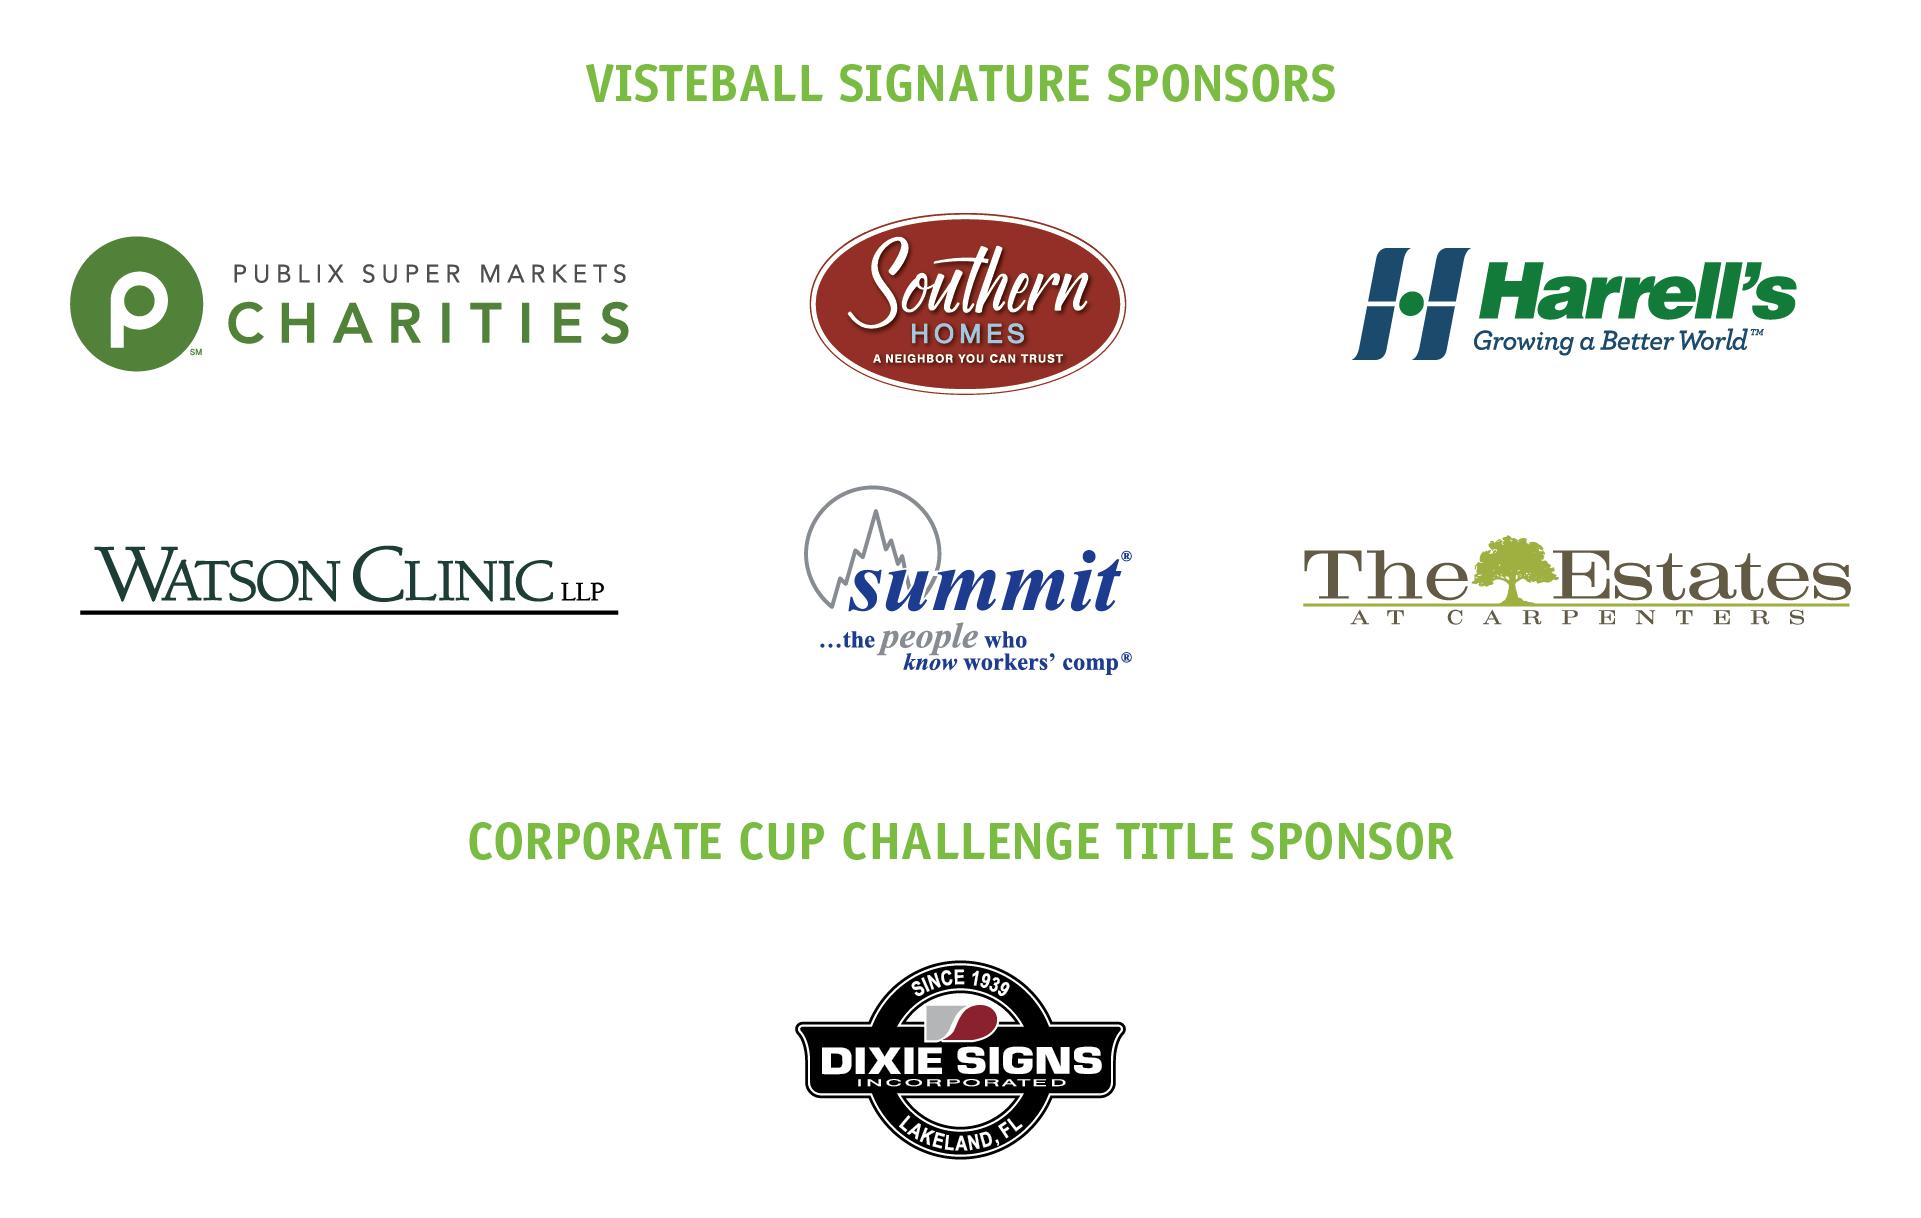 VISTEBall Signature Sponsors